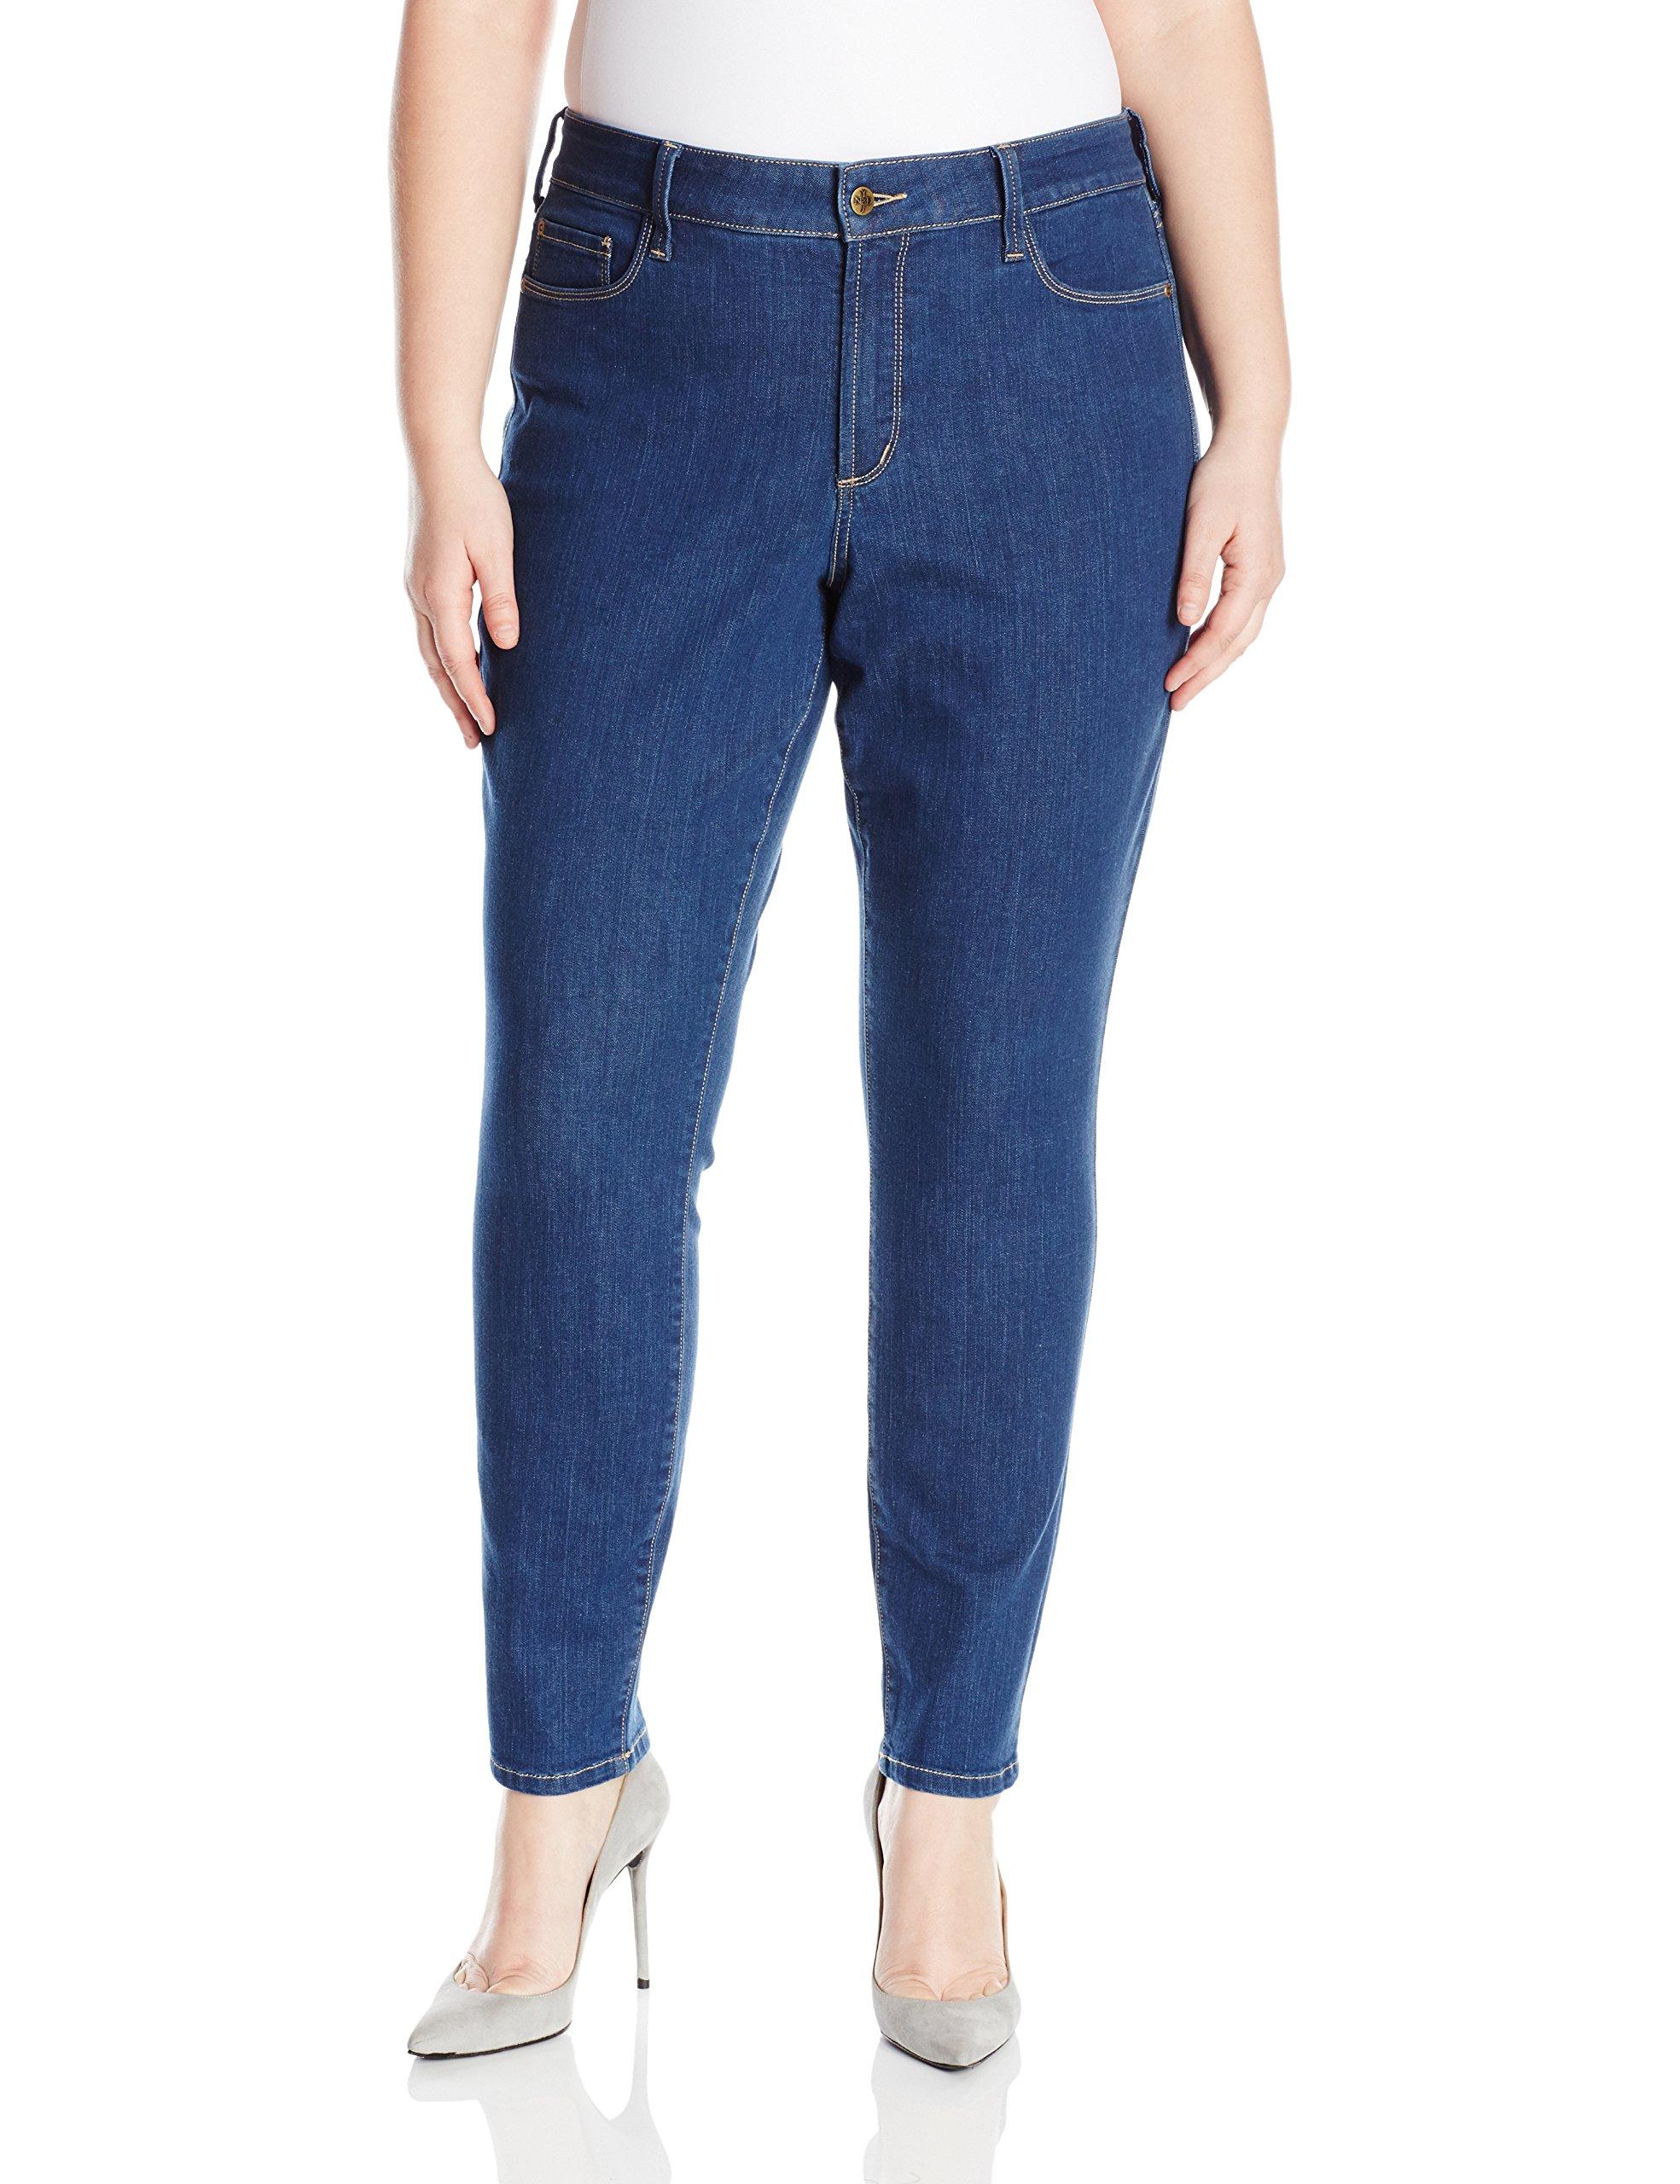 NYDJ Women's Petite Size Alina Legging Jeans, Summit, 10P